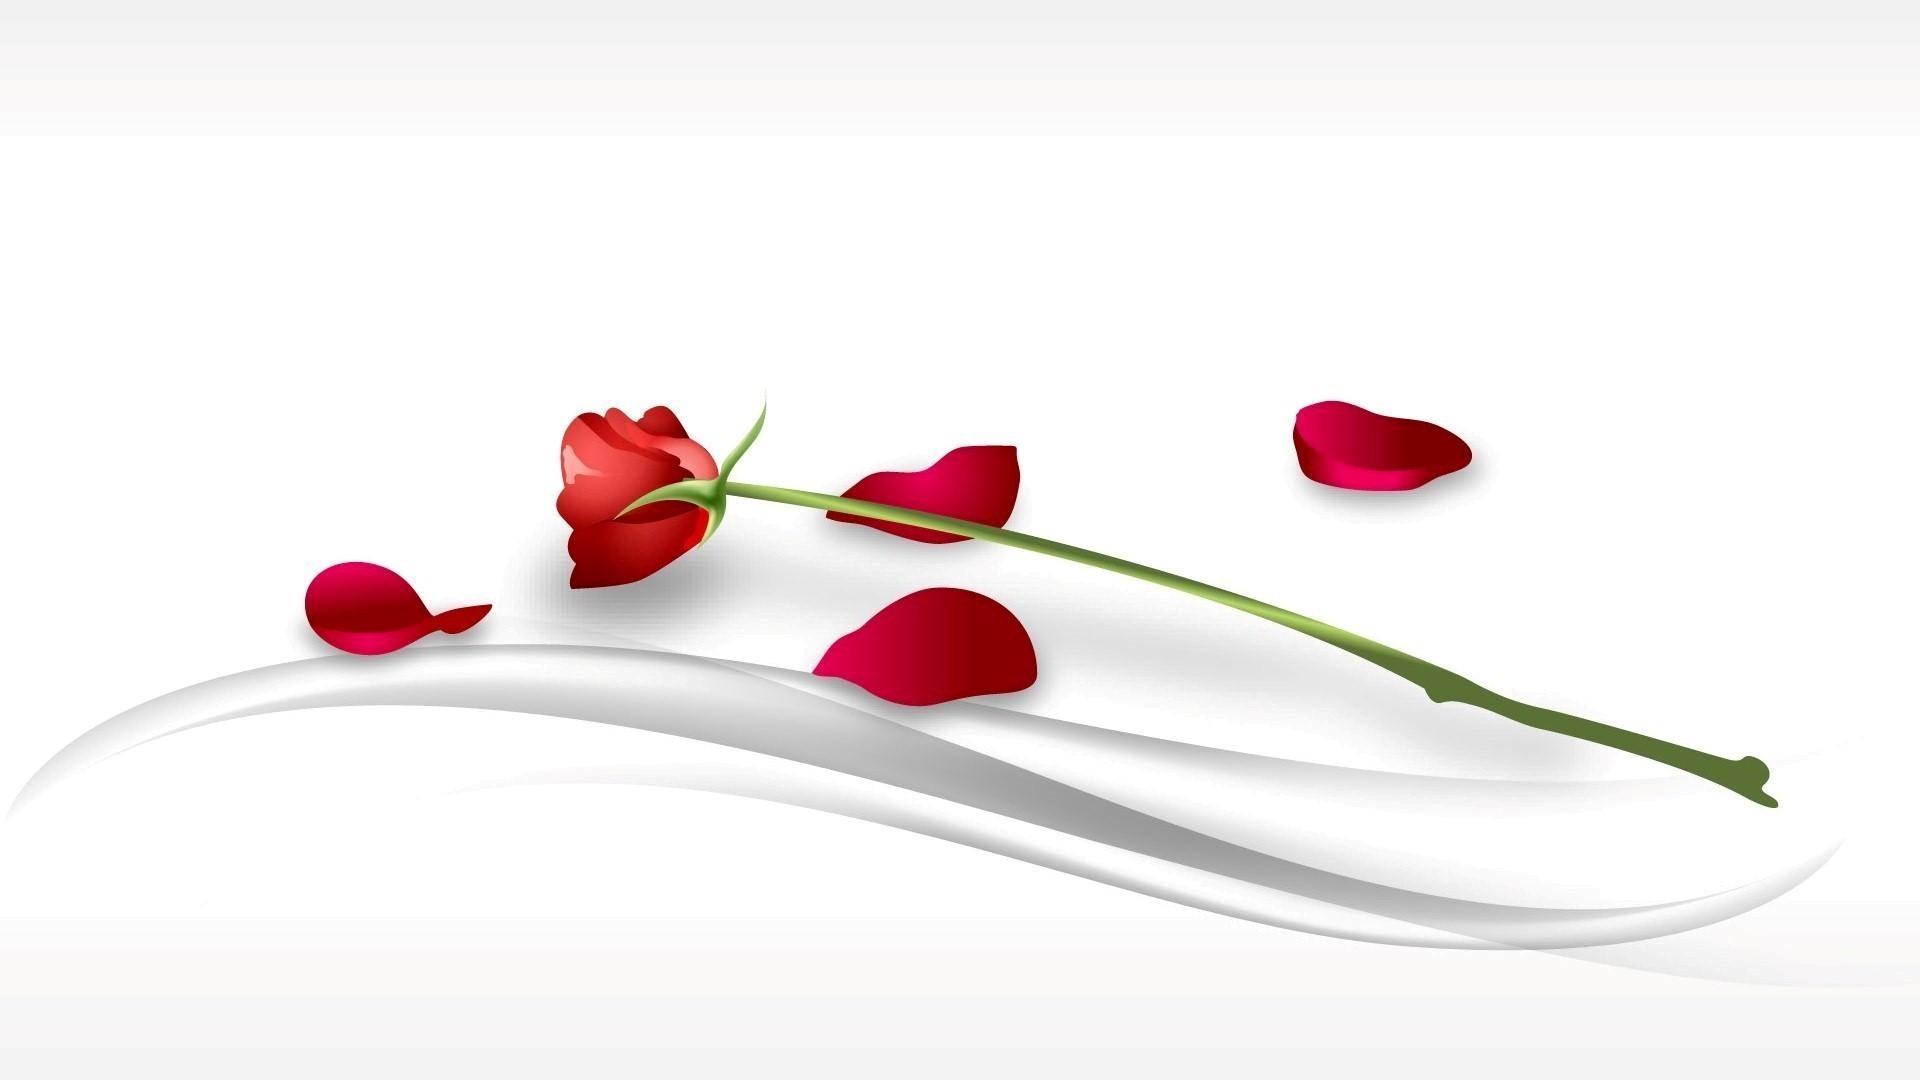 Love Heart Symbol Wallpaper HD Download Of Heart Sketch